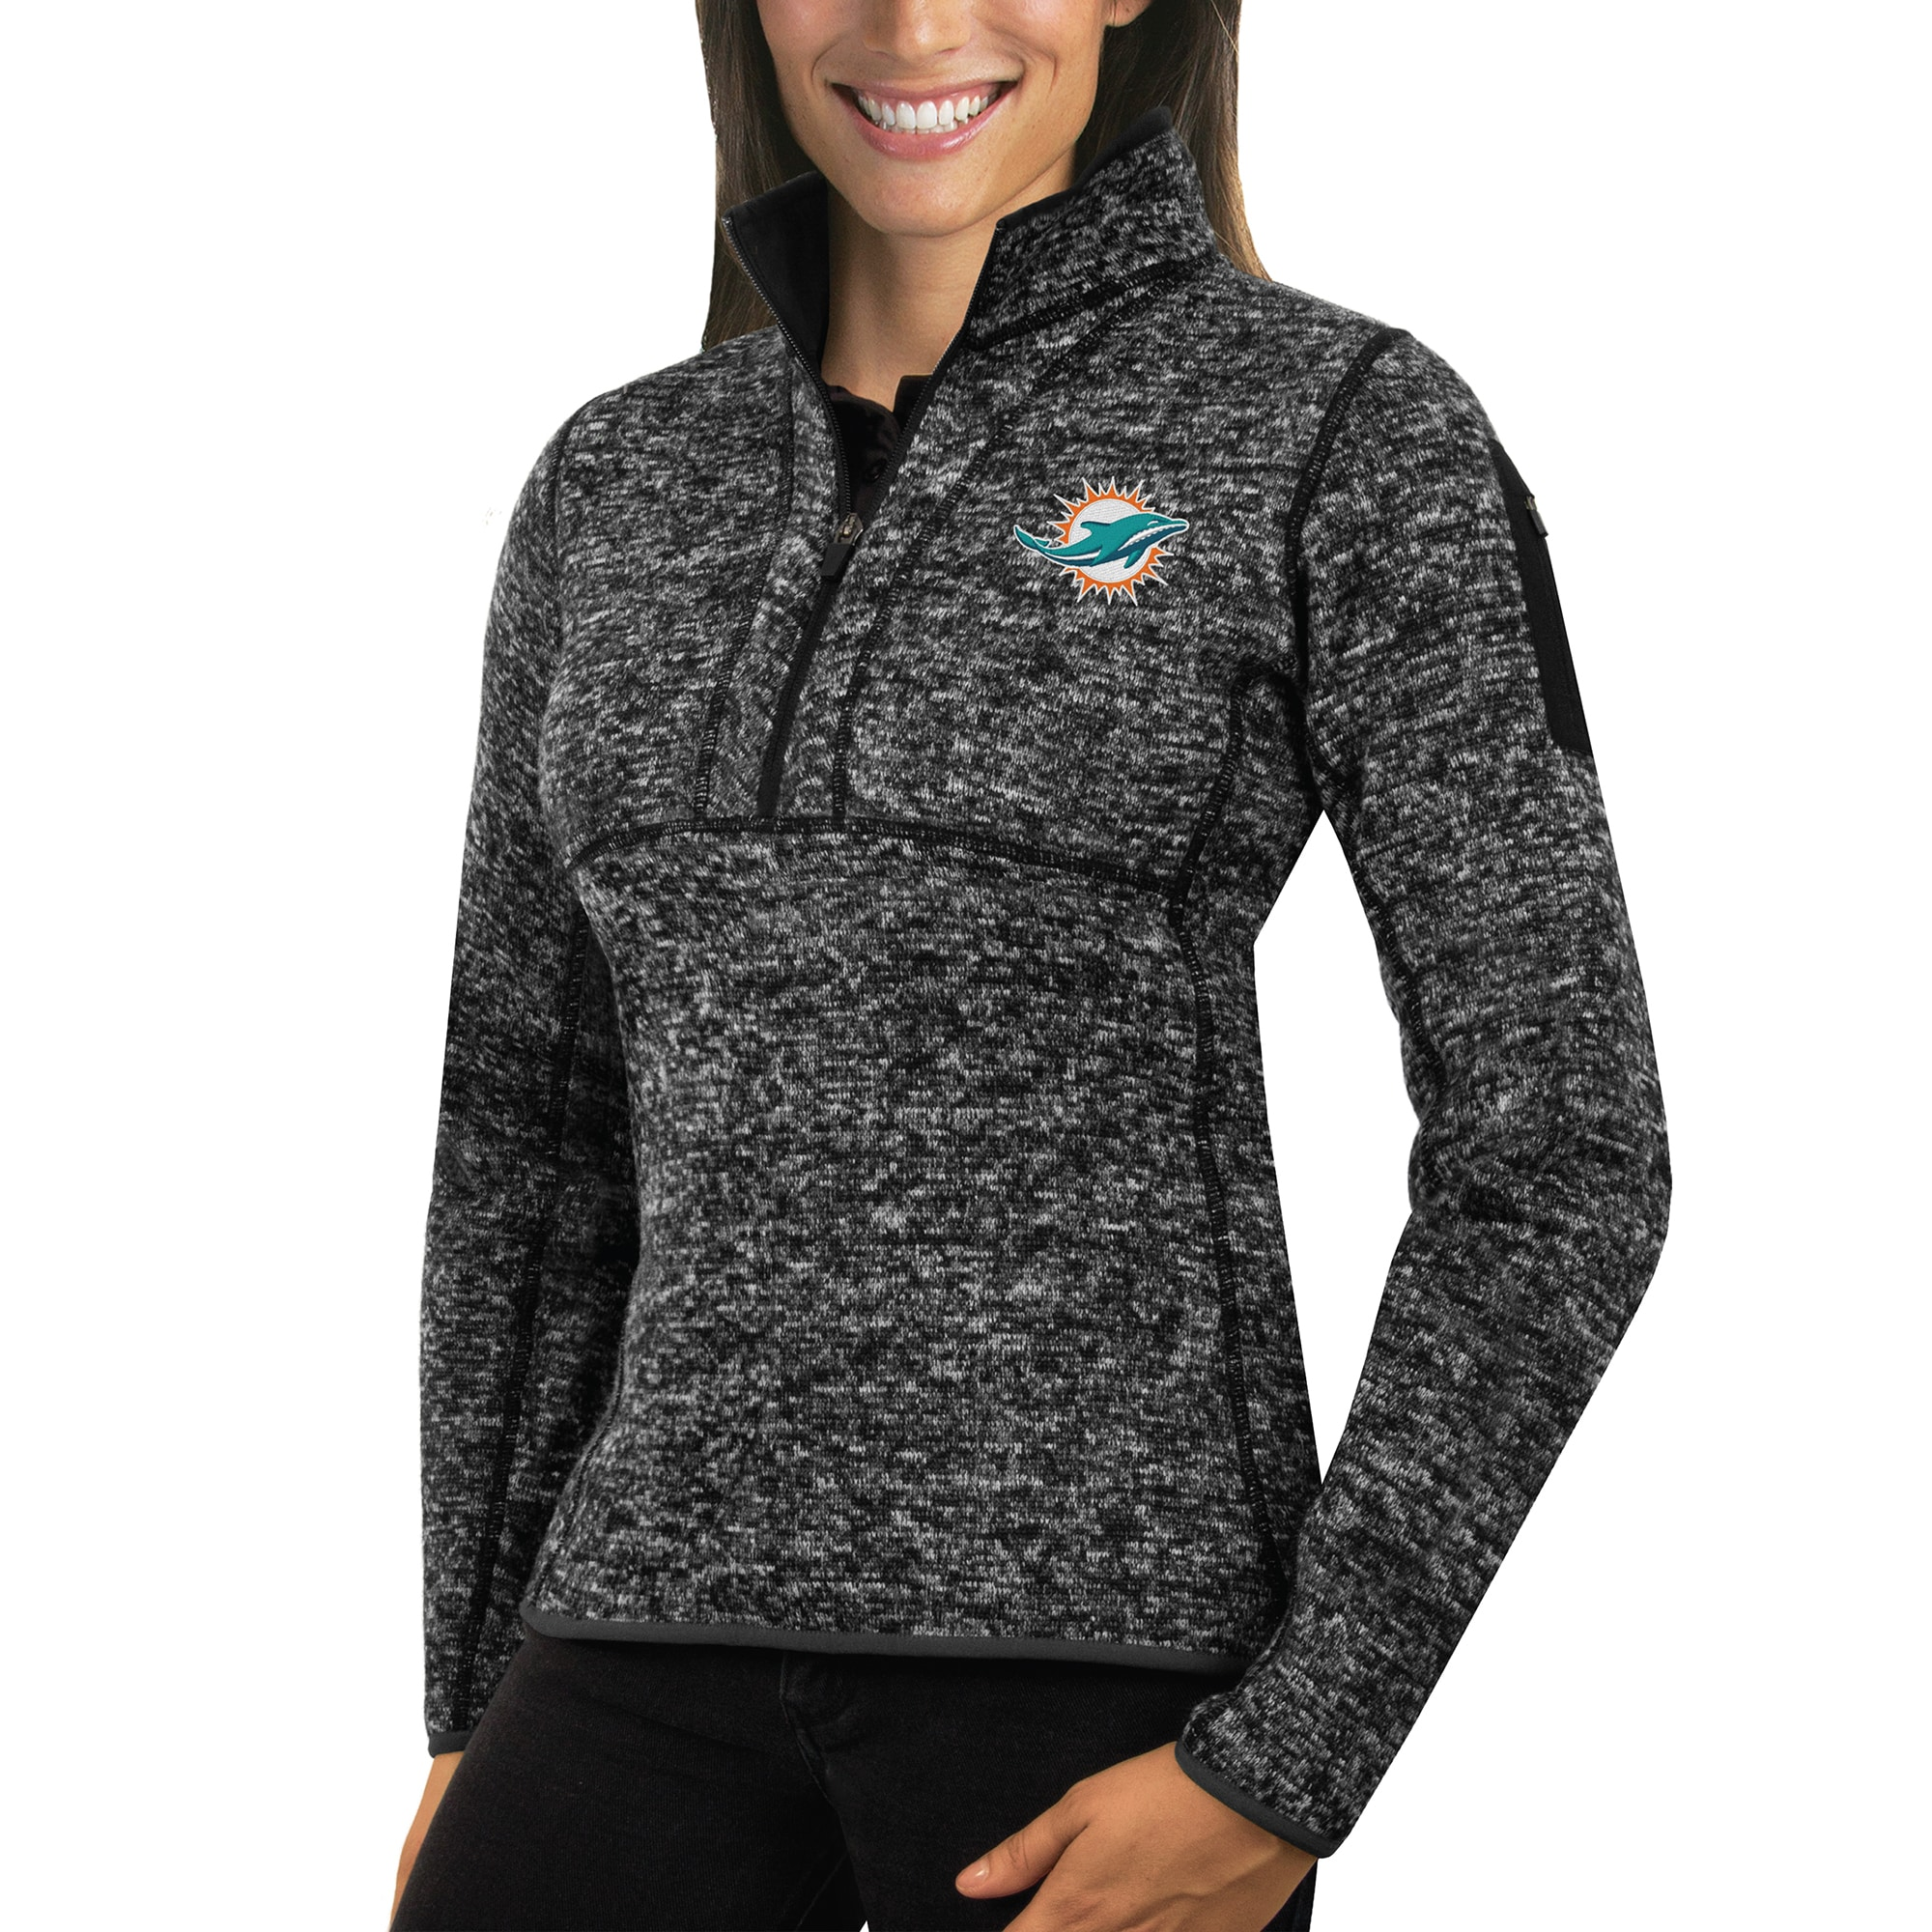 Miami Dolphins Antigua Women's Fortune Half-Zip Sweater - Heather Black